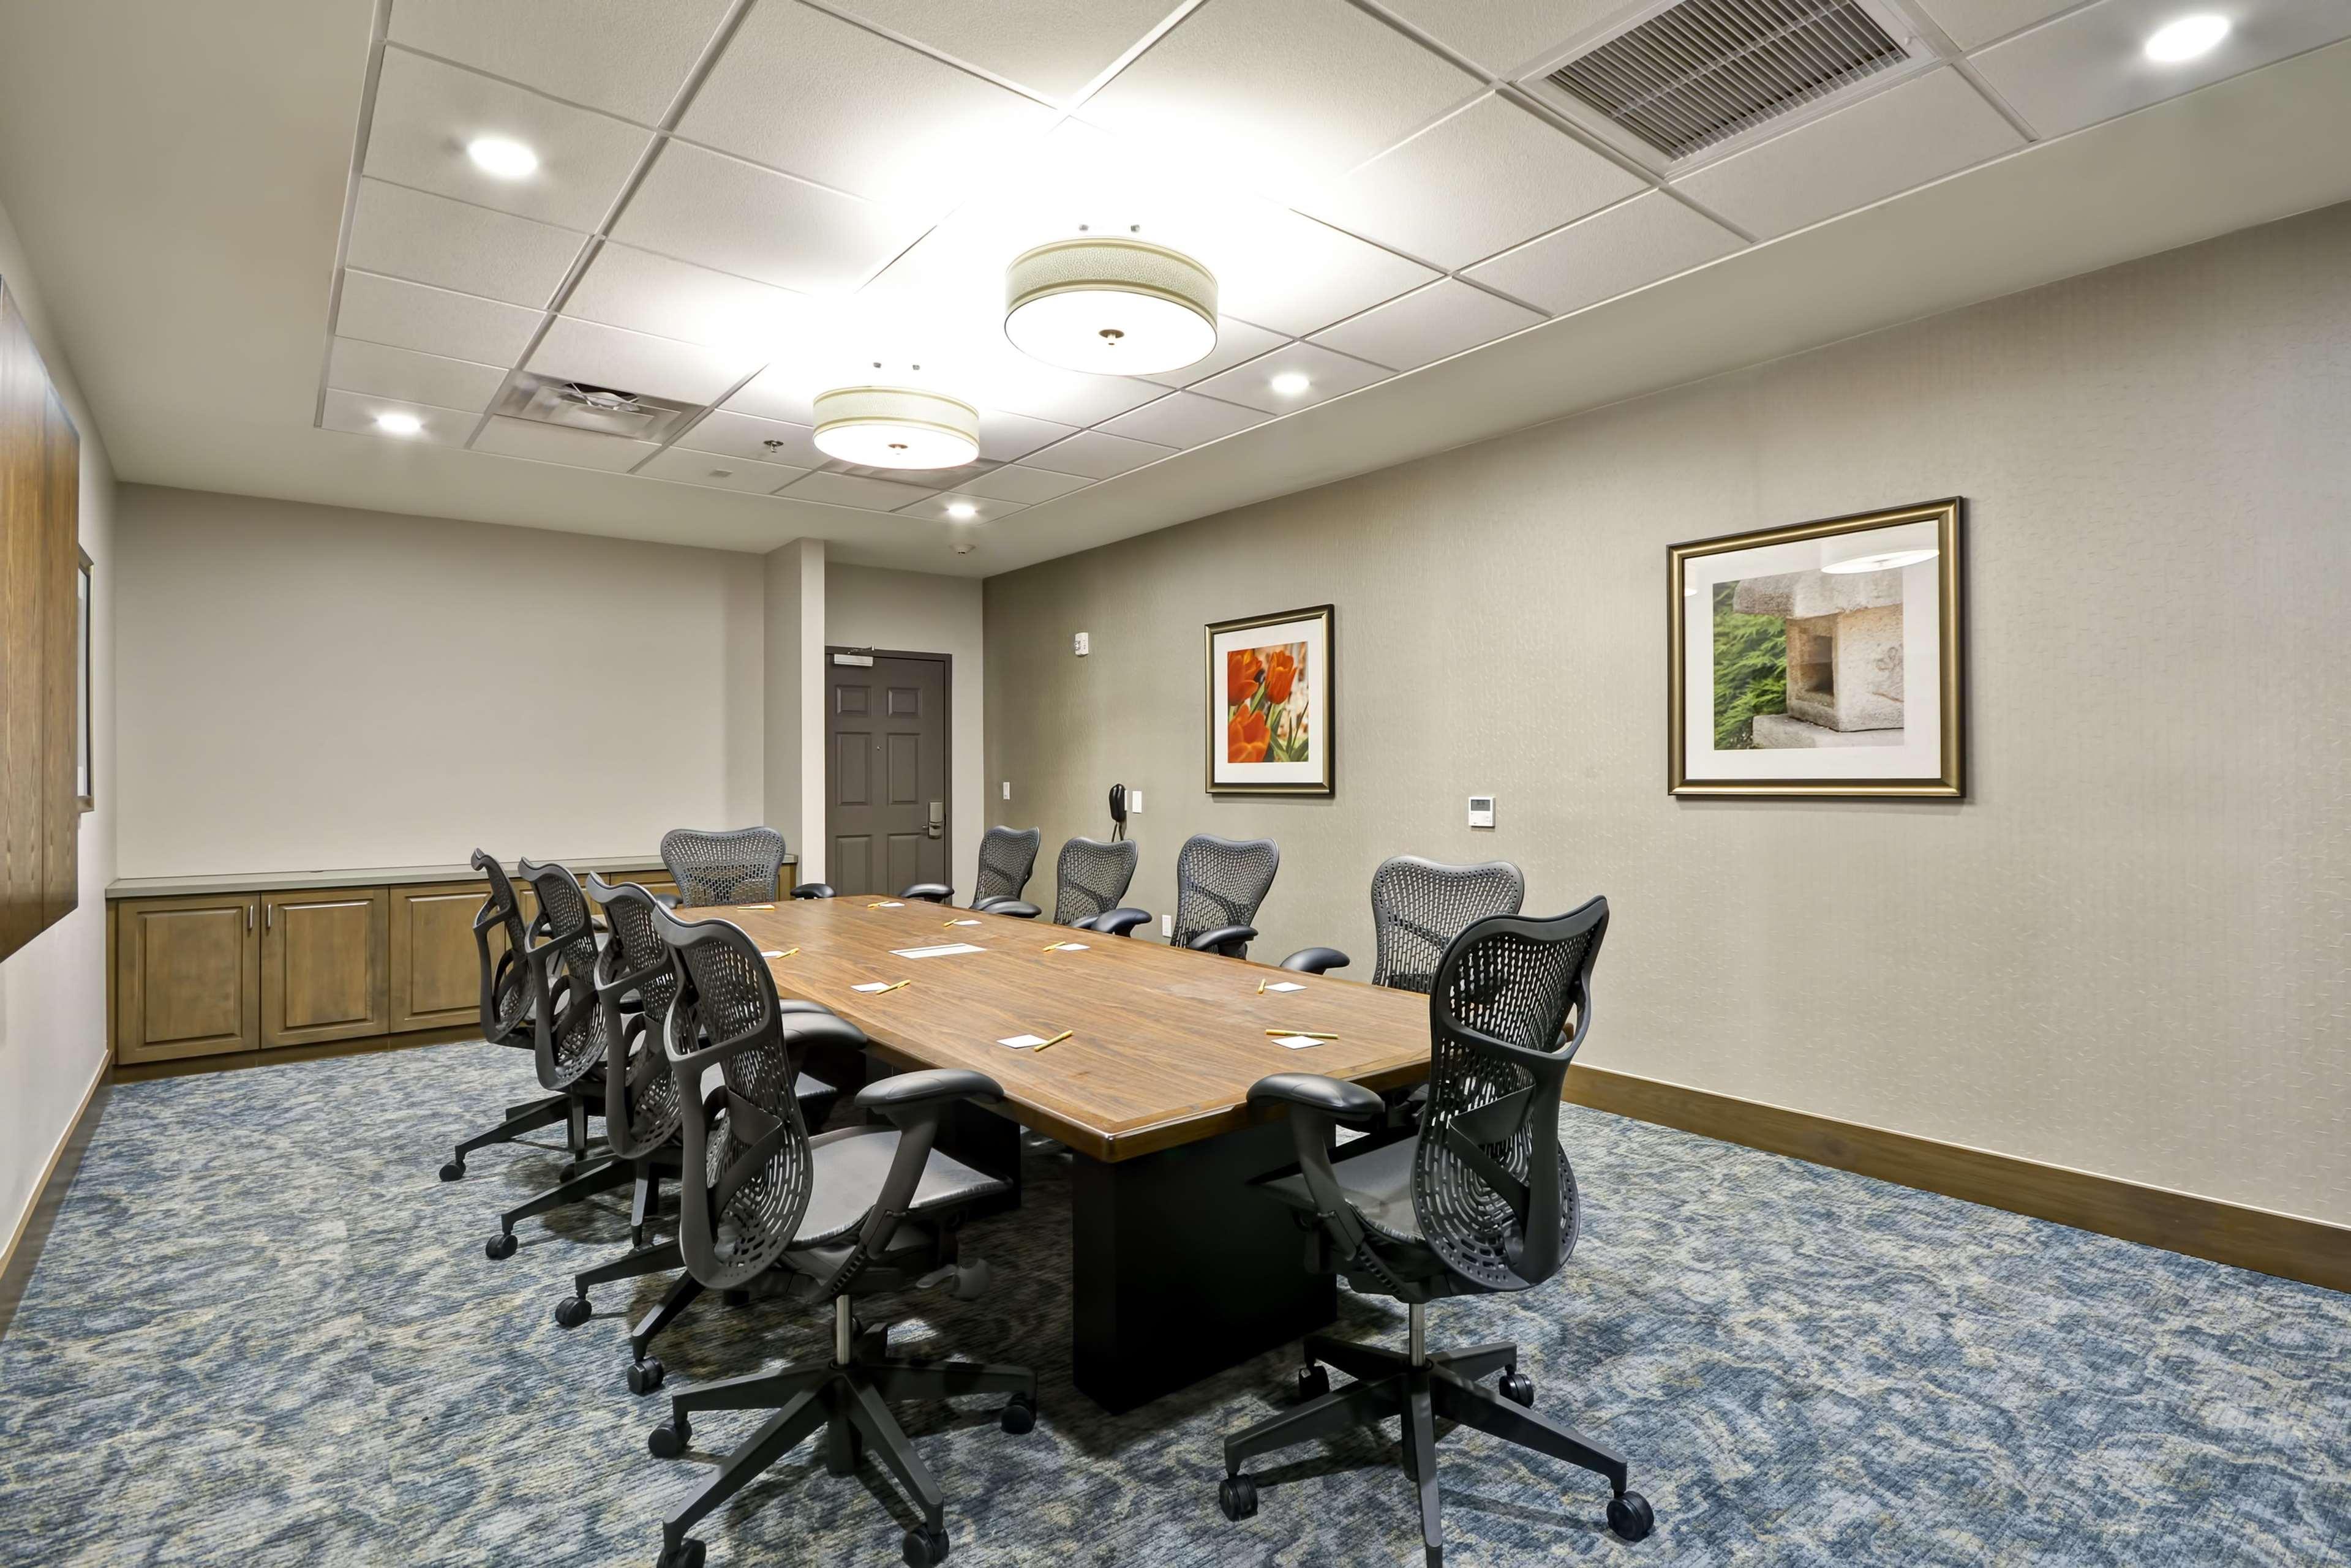 Hilton Garden Inn Phoenix/Tempe ASU Area image 25